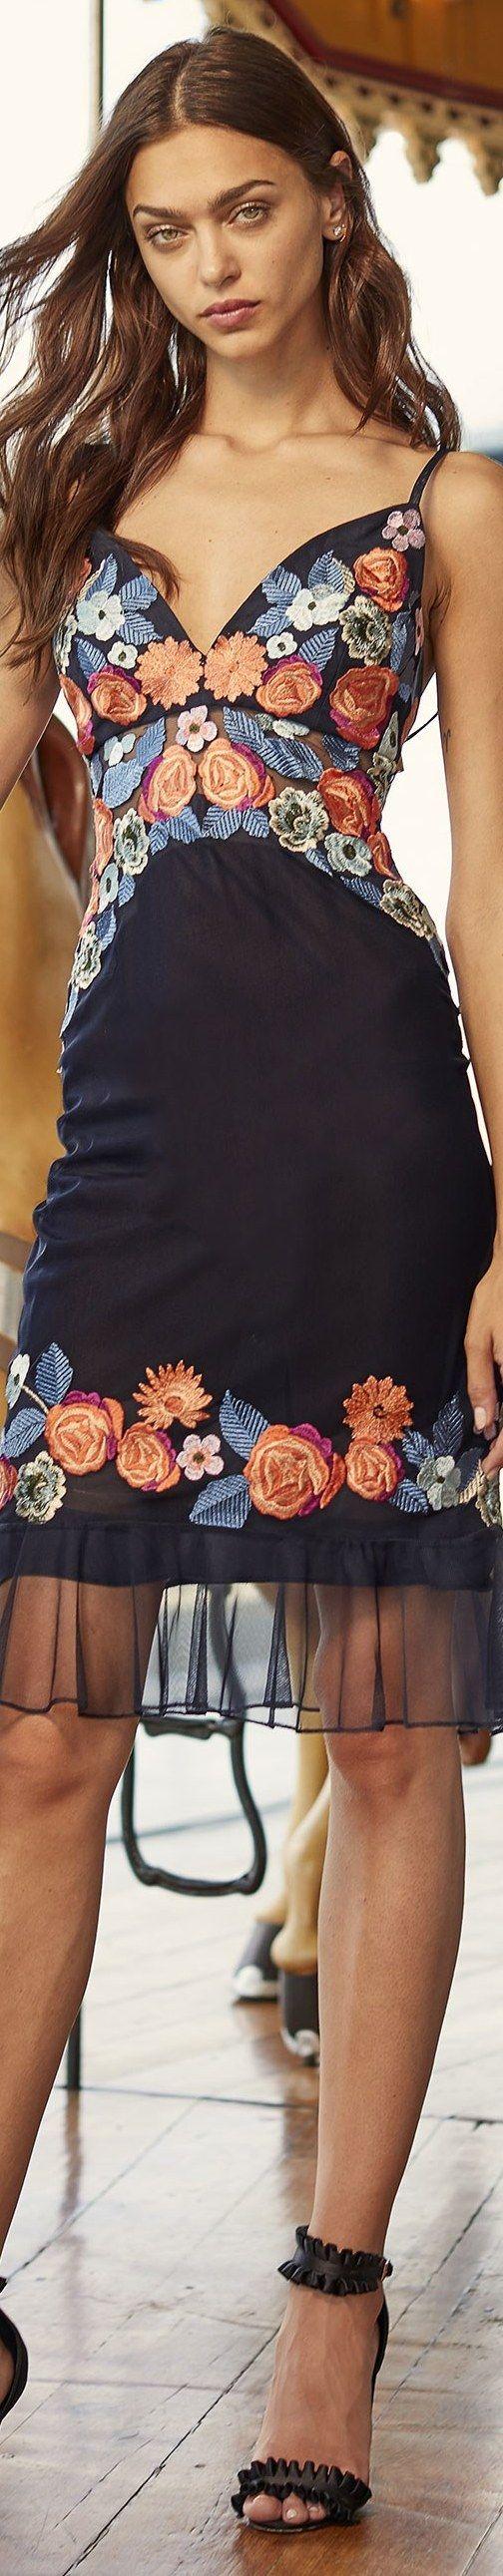 best street fashion images on pinterest feminine fashion for